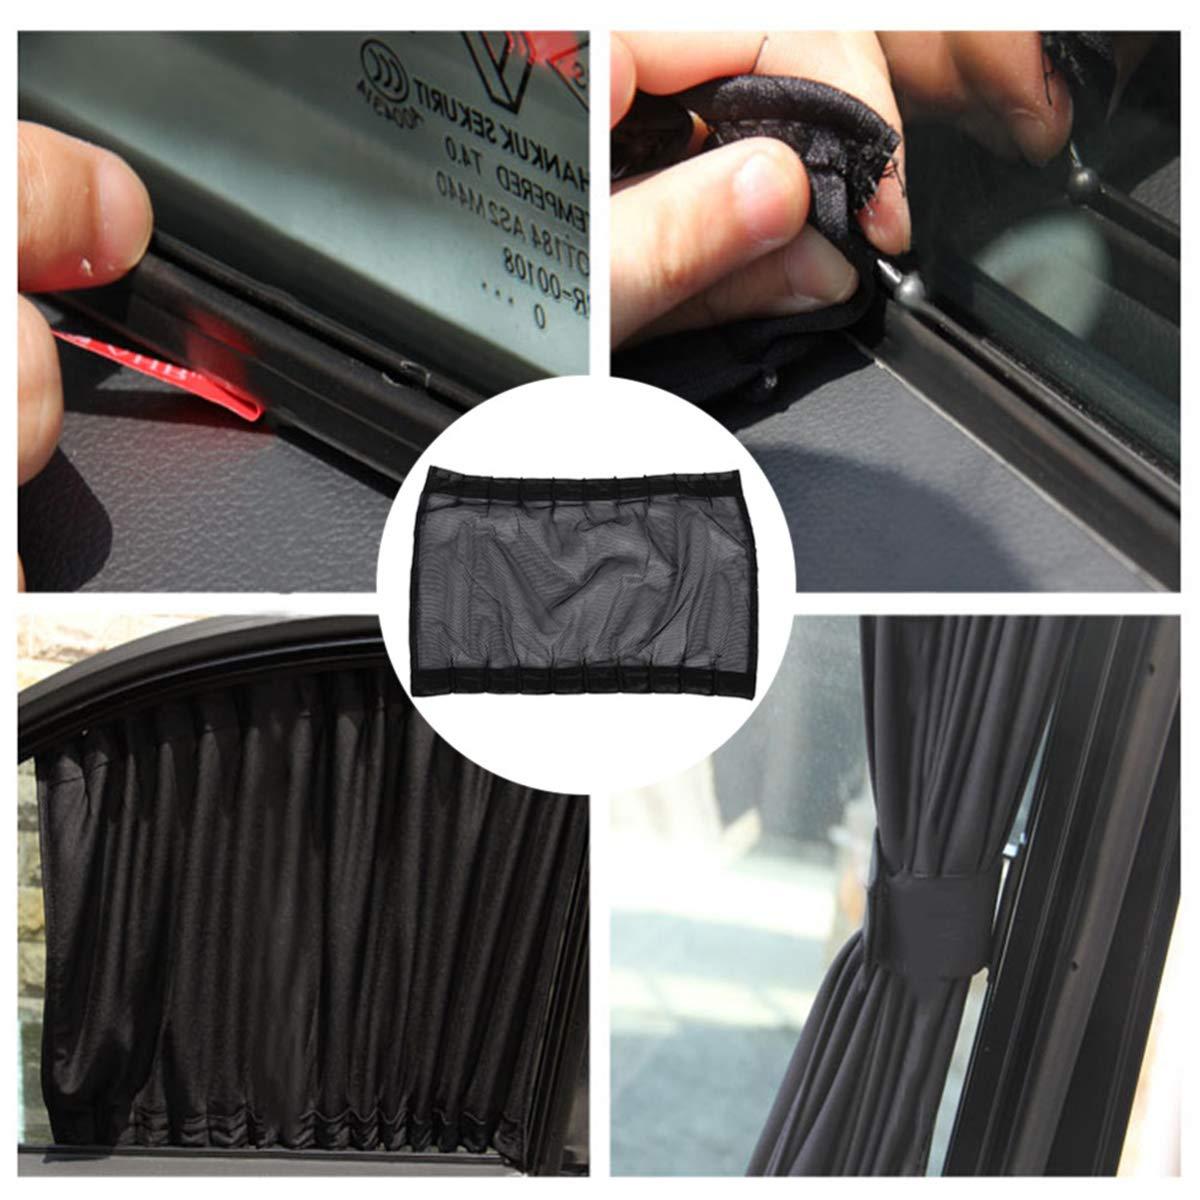 2 Pack Car Curtains Window Shades UV Protection Auto Privacy Shade Valances for Side Window Universal Windshield Sunshade Van Curtain Mesh Screen Blocks Heat Sun Shield Keeps Vehicle SUV Cool